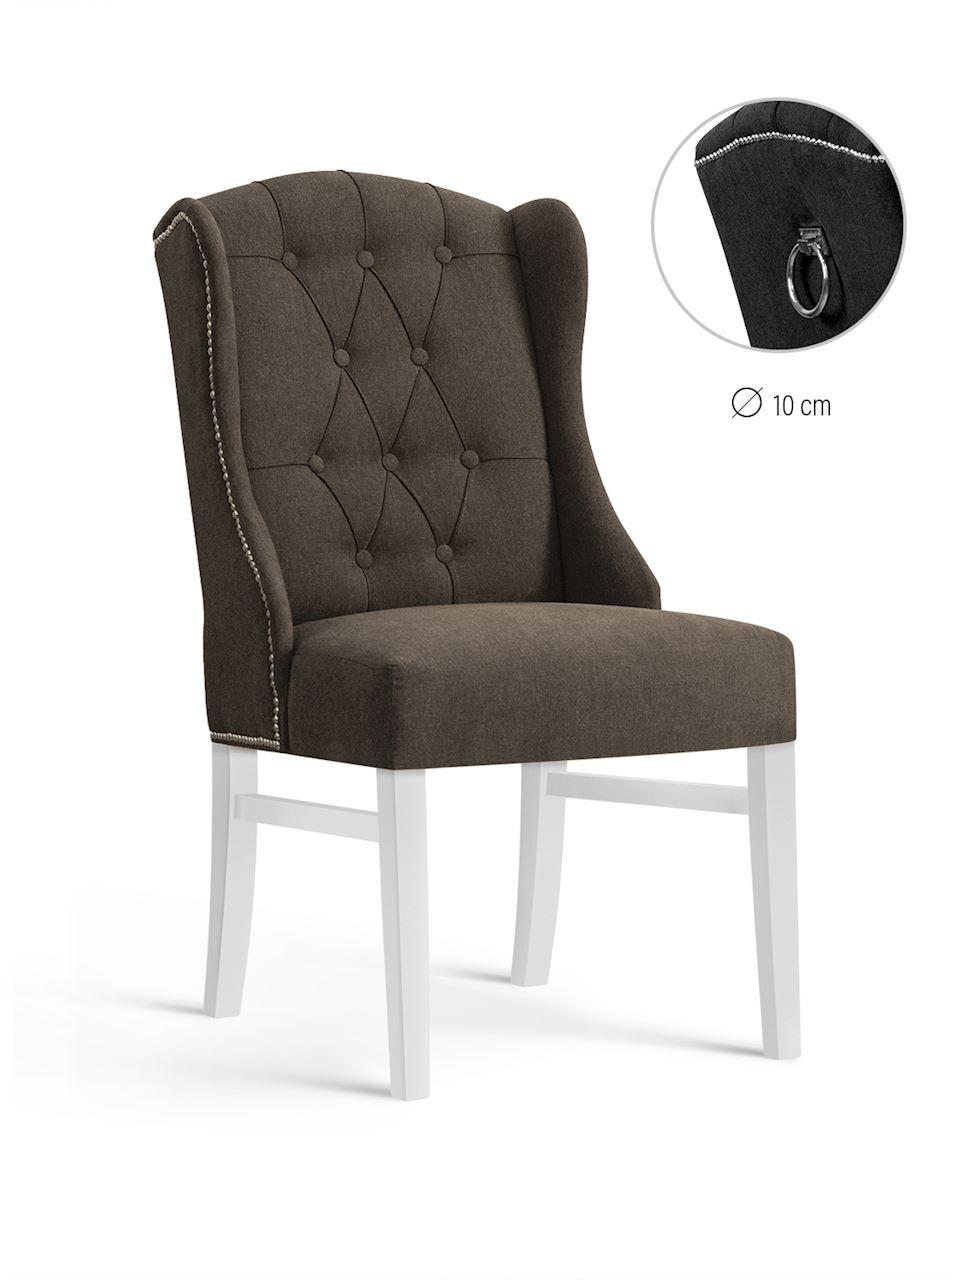 Scaun tapitat cu stofa, cu picioare din lemn Royal Brown / White, l55xA74xH105 cm